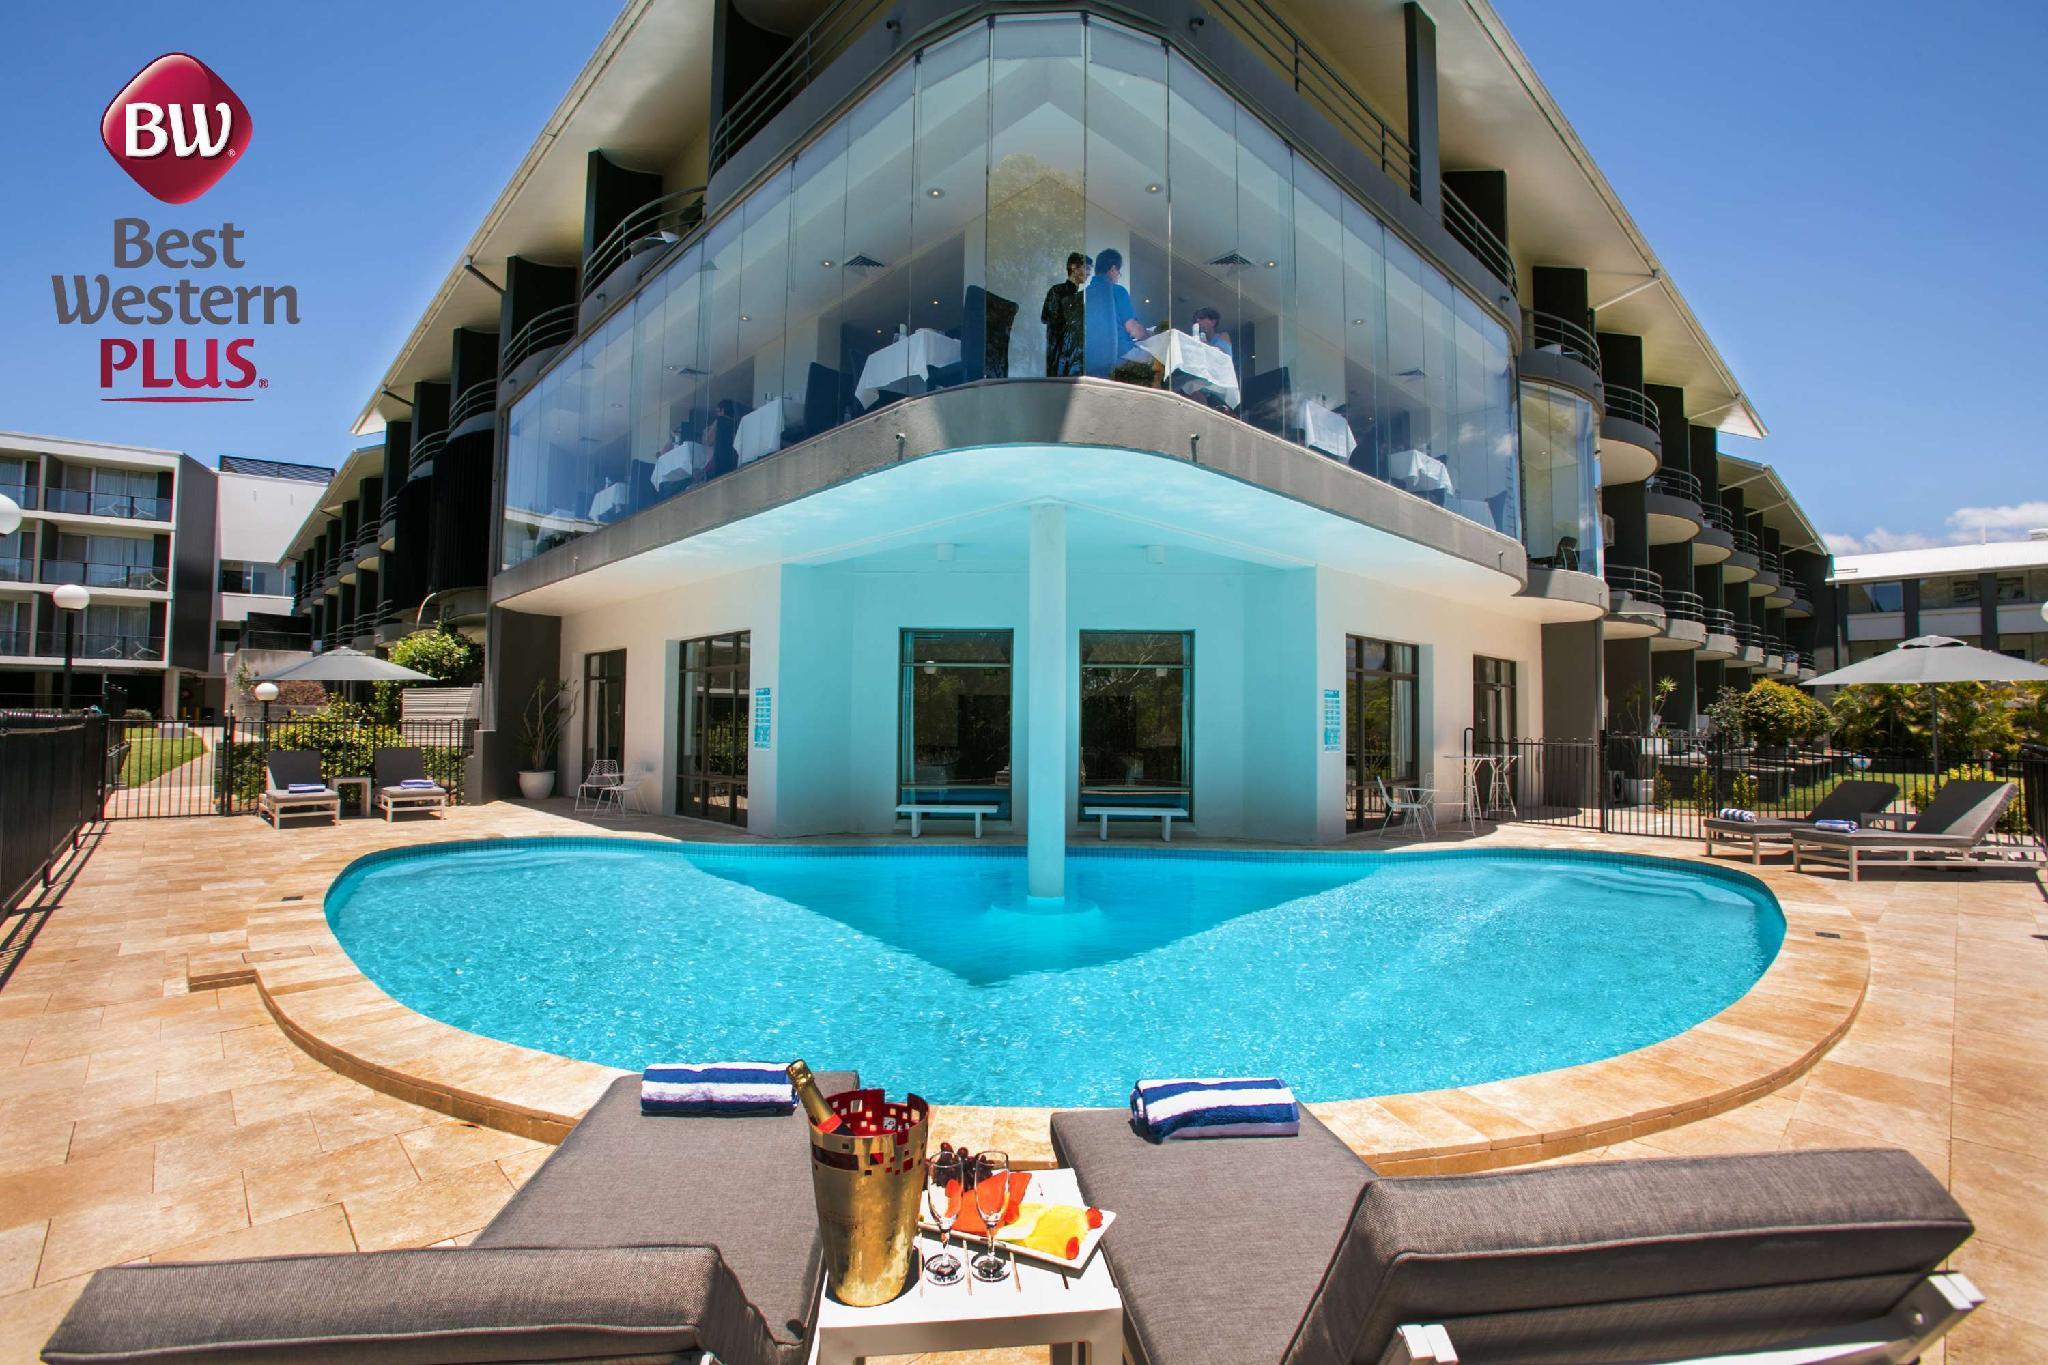 Best Western Plus Apollo International Hotel